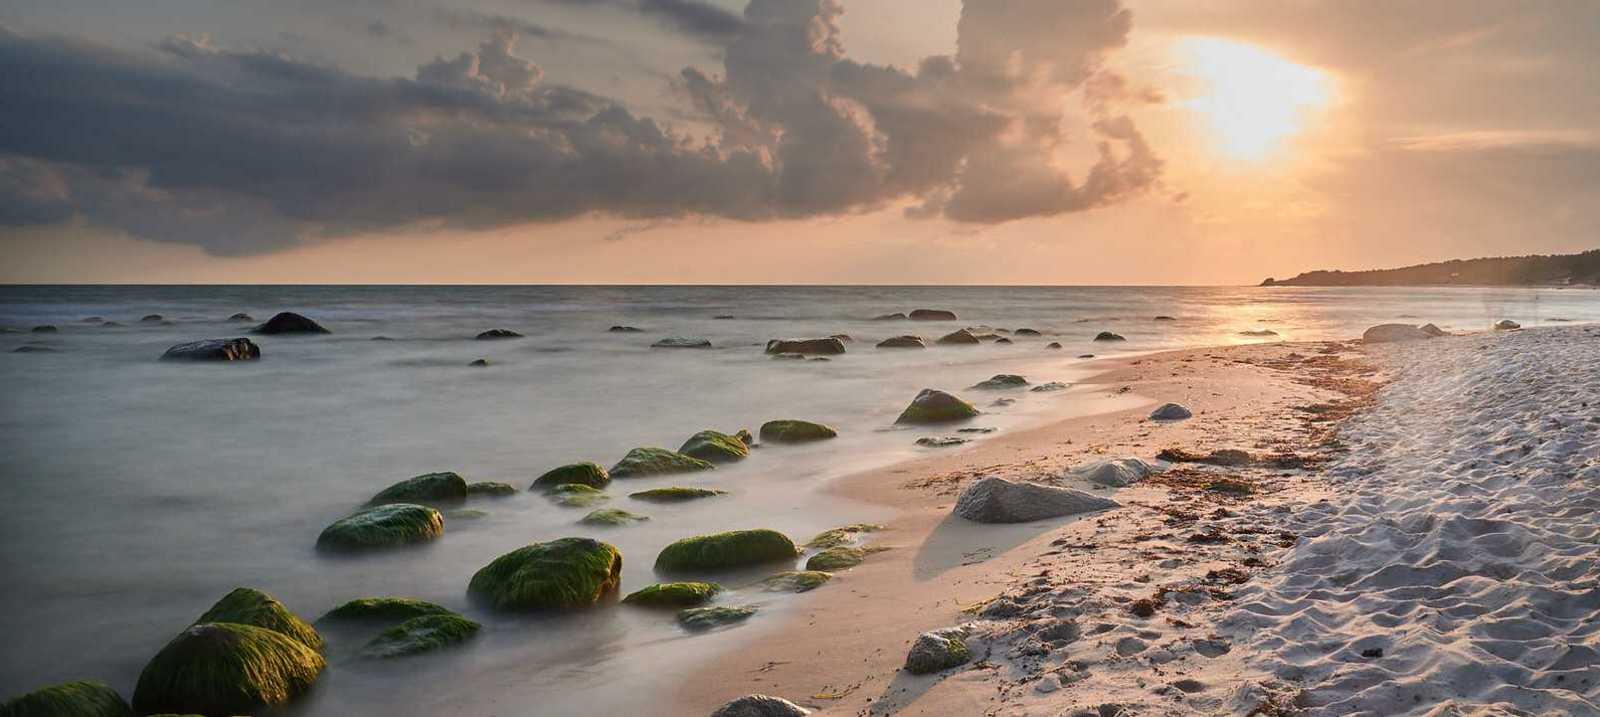 Sonnenuntergang am Strand von Bornholm